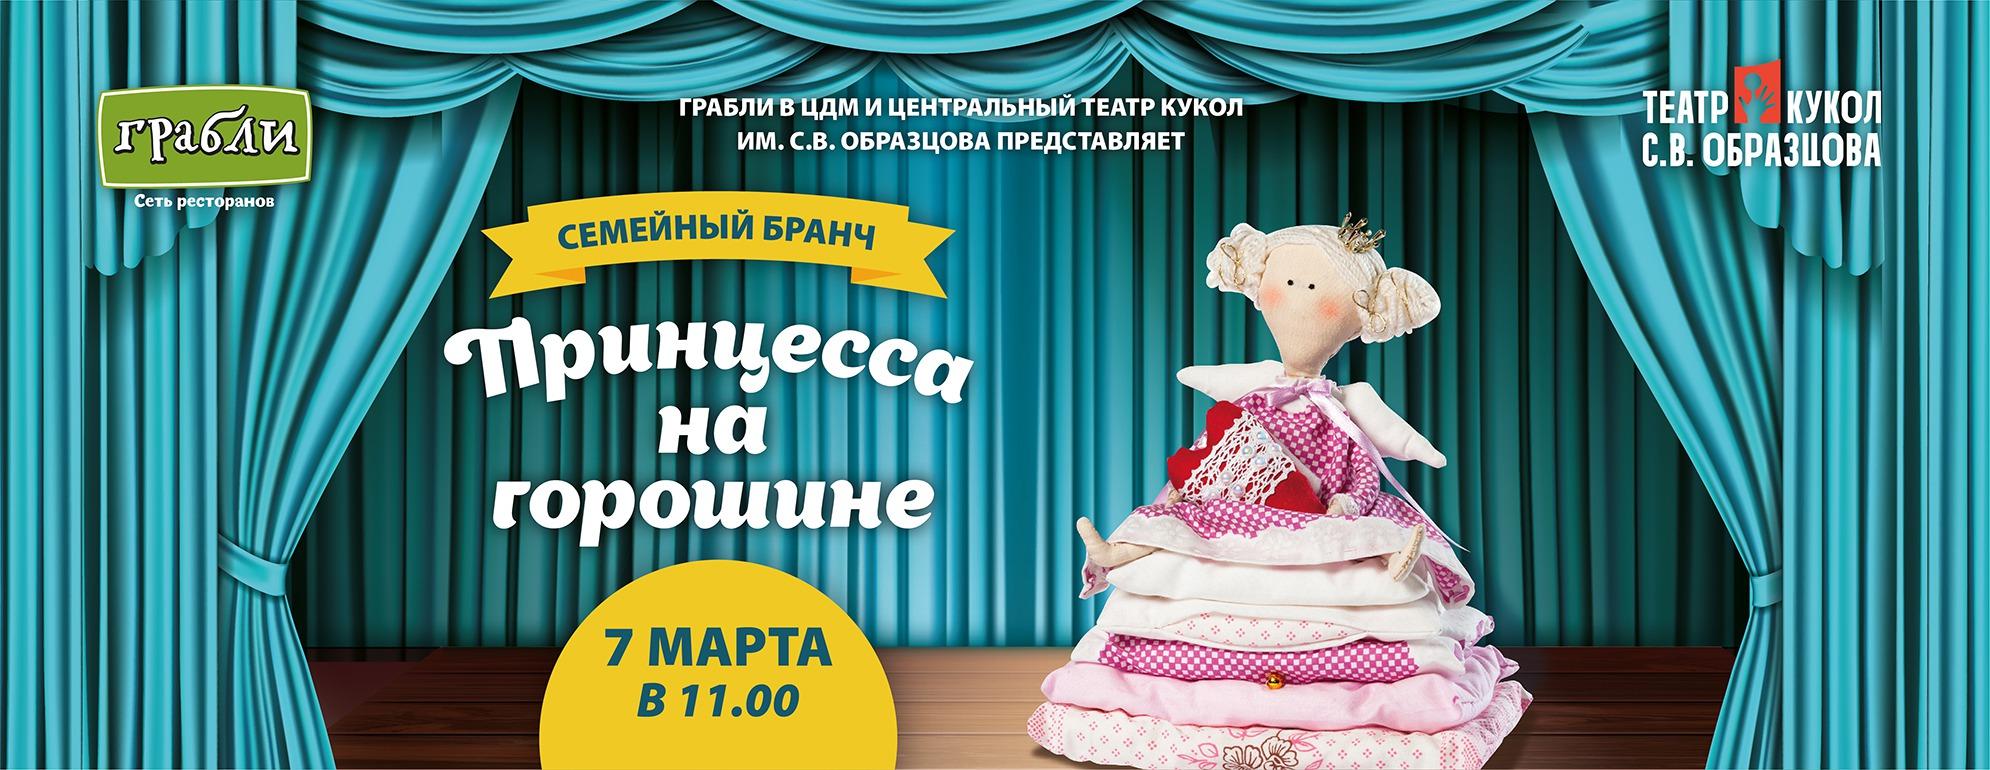 https://grabli.ru/semejnyj-branch-v-cdm-so-spektaklem-ot-centralnogo-teatra-kukol-im-s-v-obrazcova/